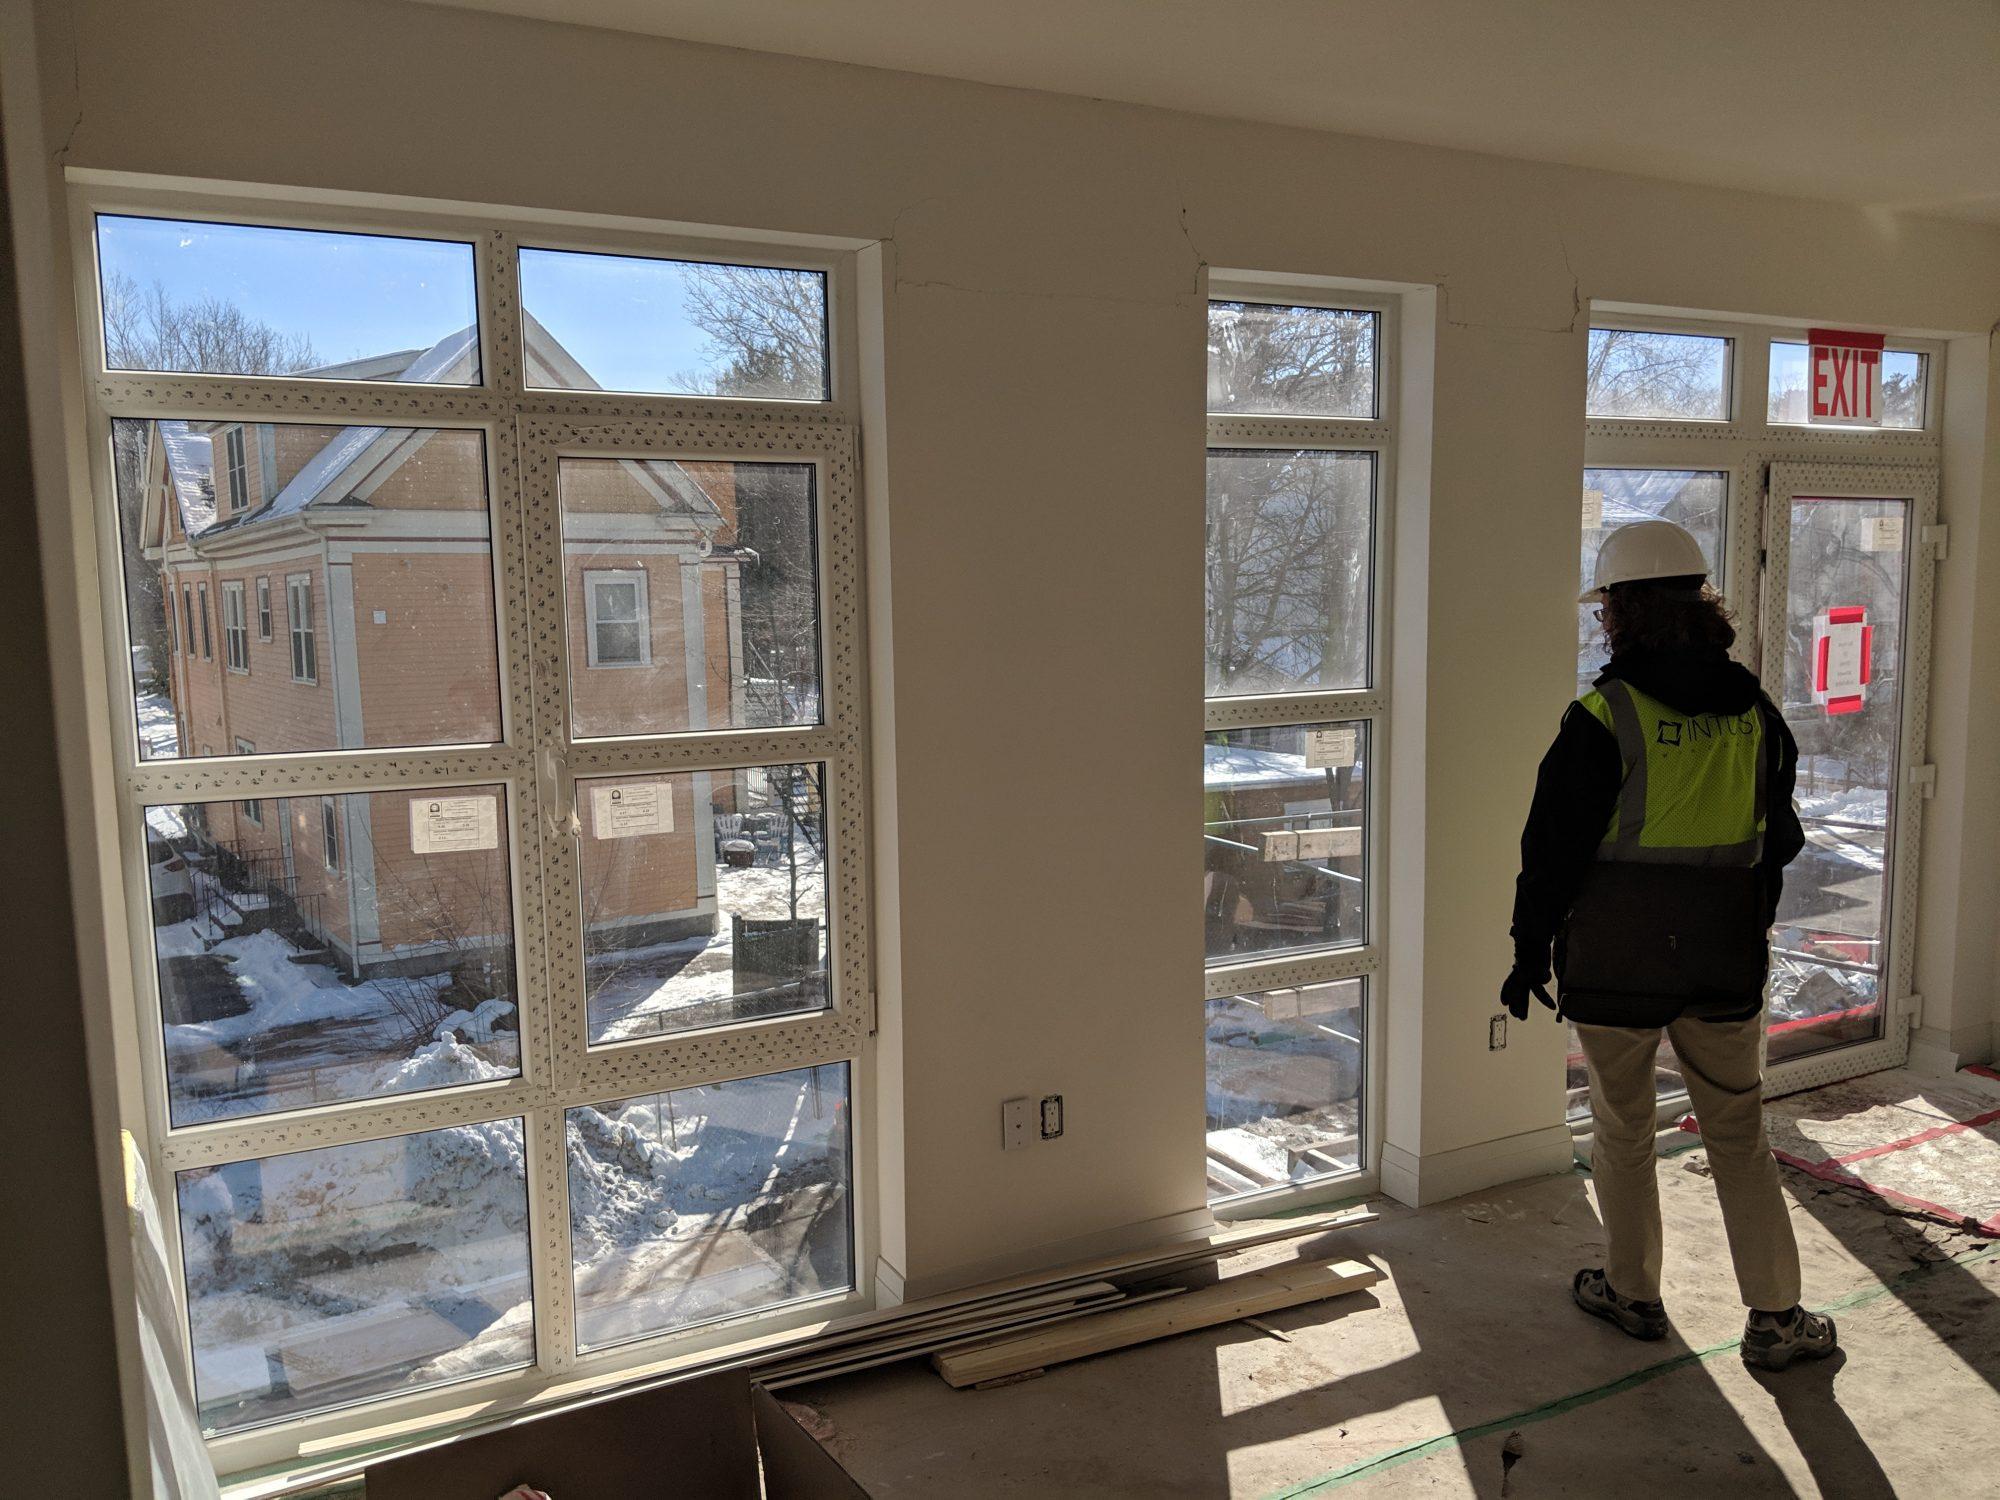 28 Austin Street in-progress